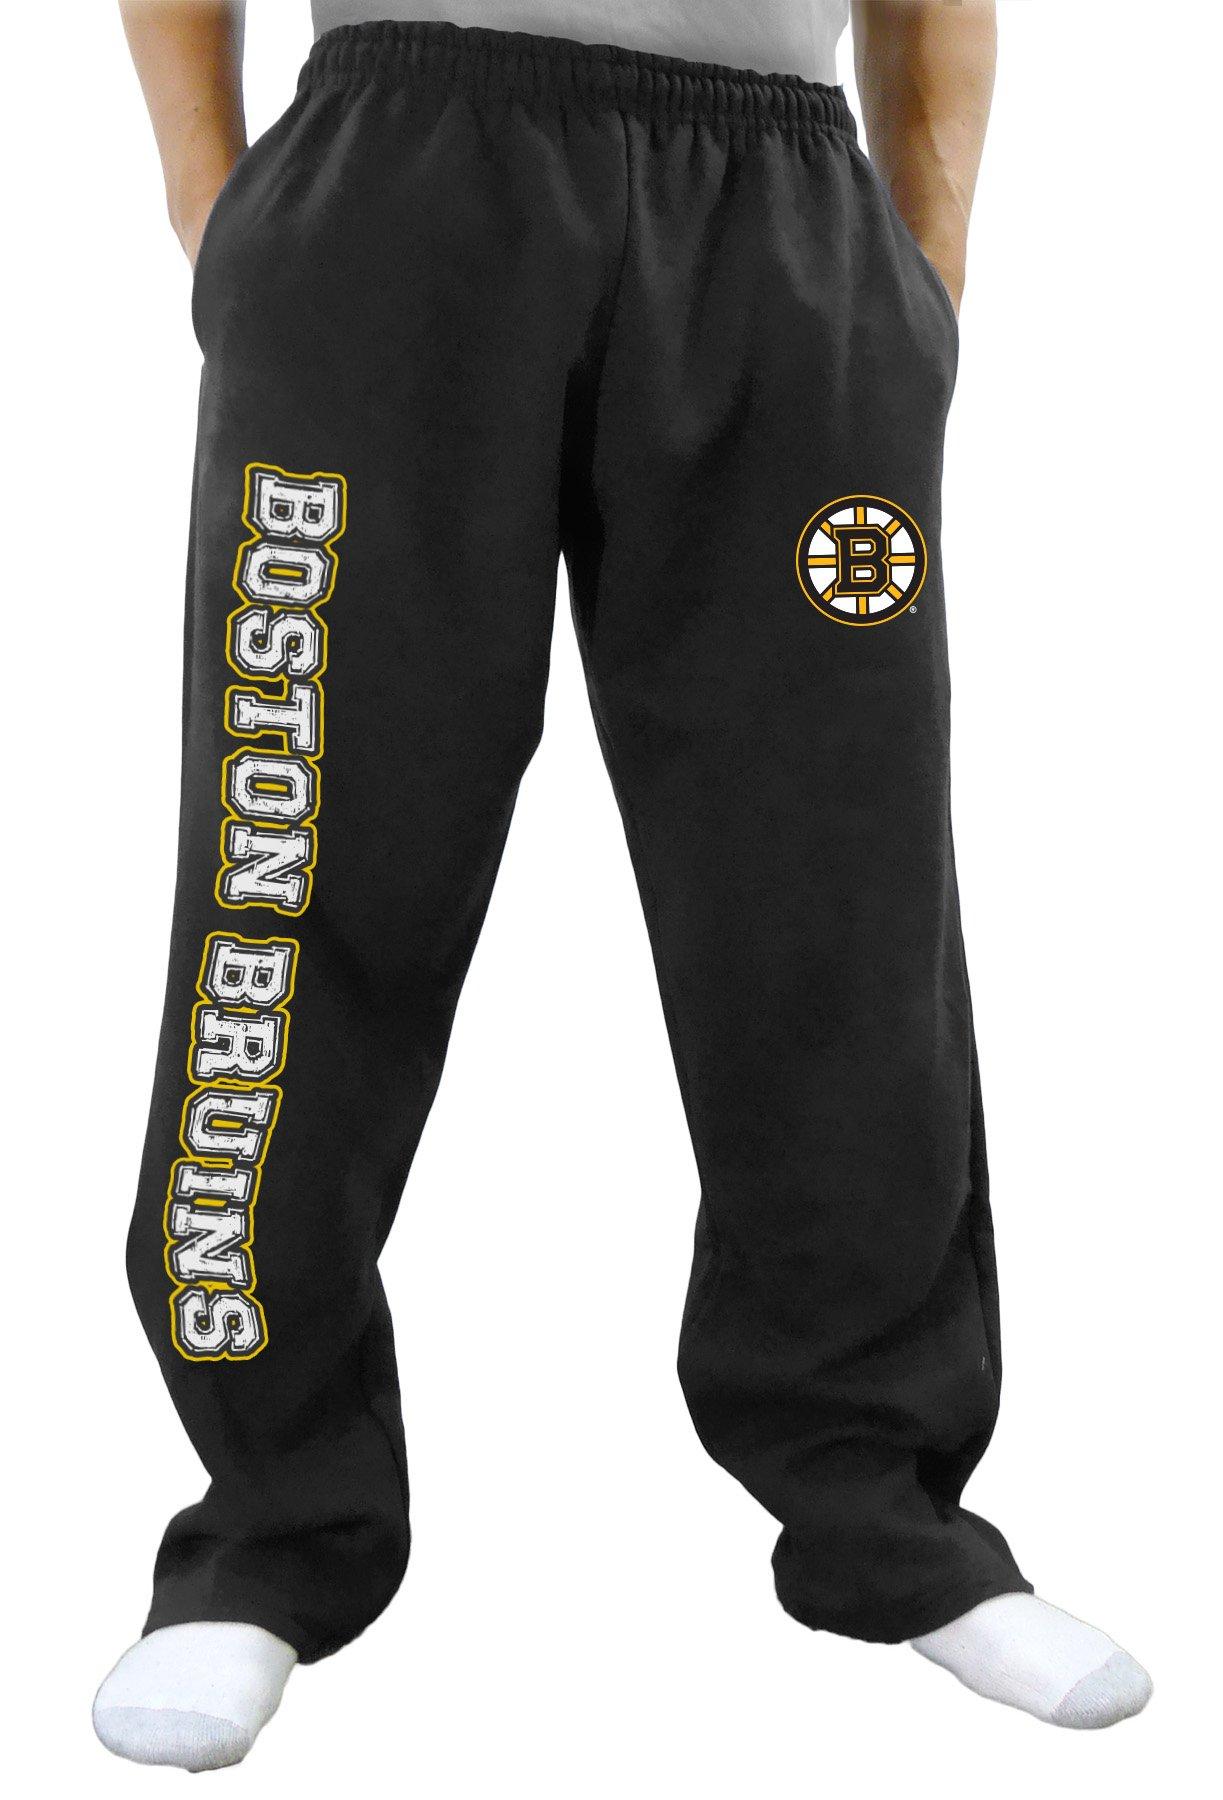 NHL Men's Premium Fleece Official Team Sweatpants (Boston Bruins, Medium)